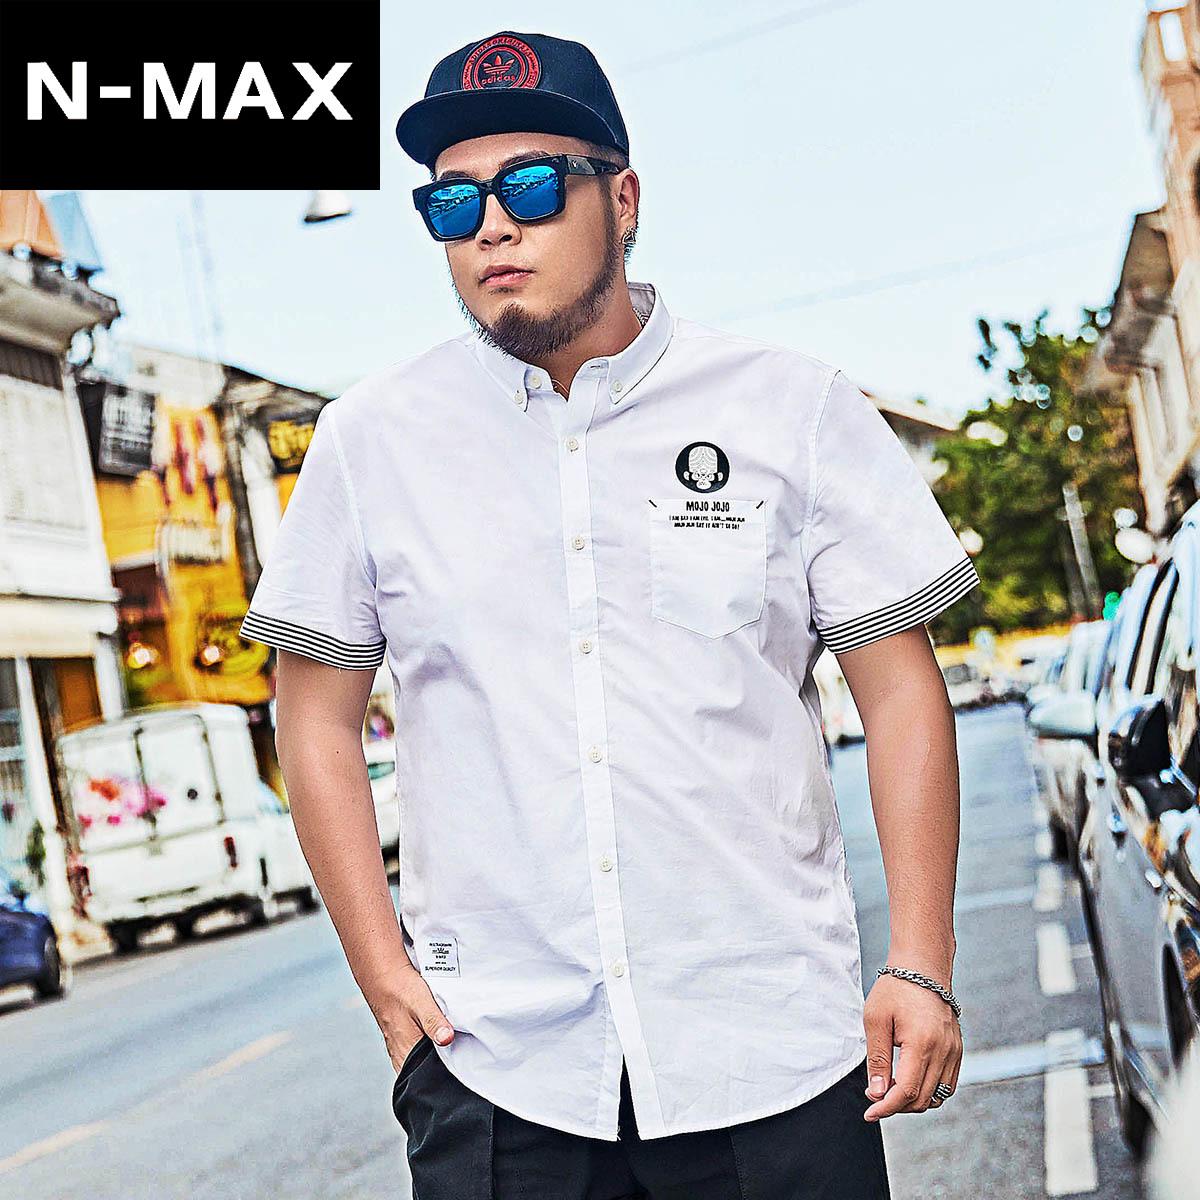 NMAX大码男装潮牌 潮胖子宽松纯棉短袖衬衫 加肥加大半袖翻领衬衣